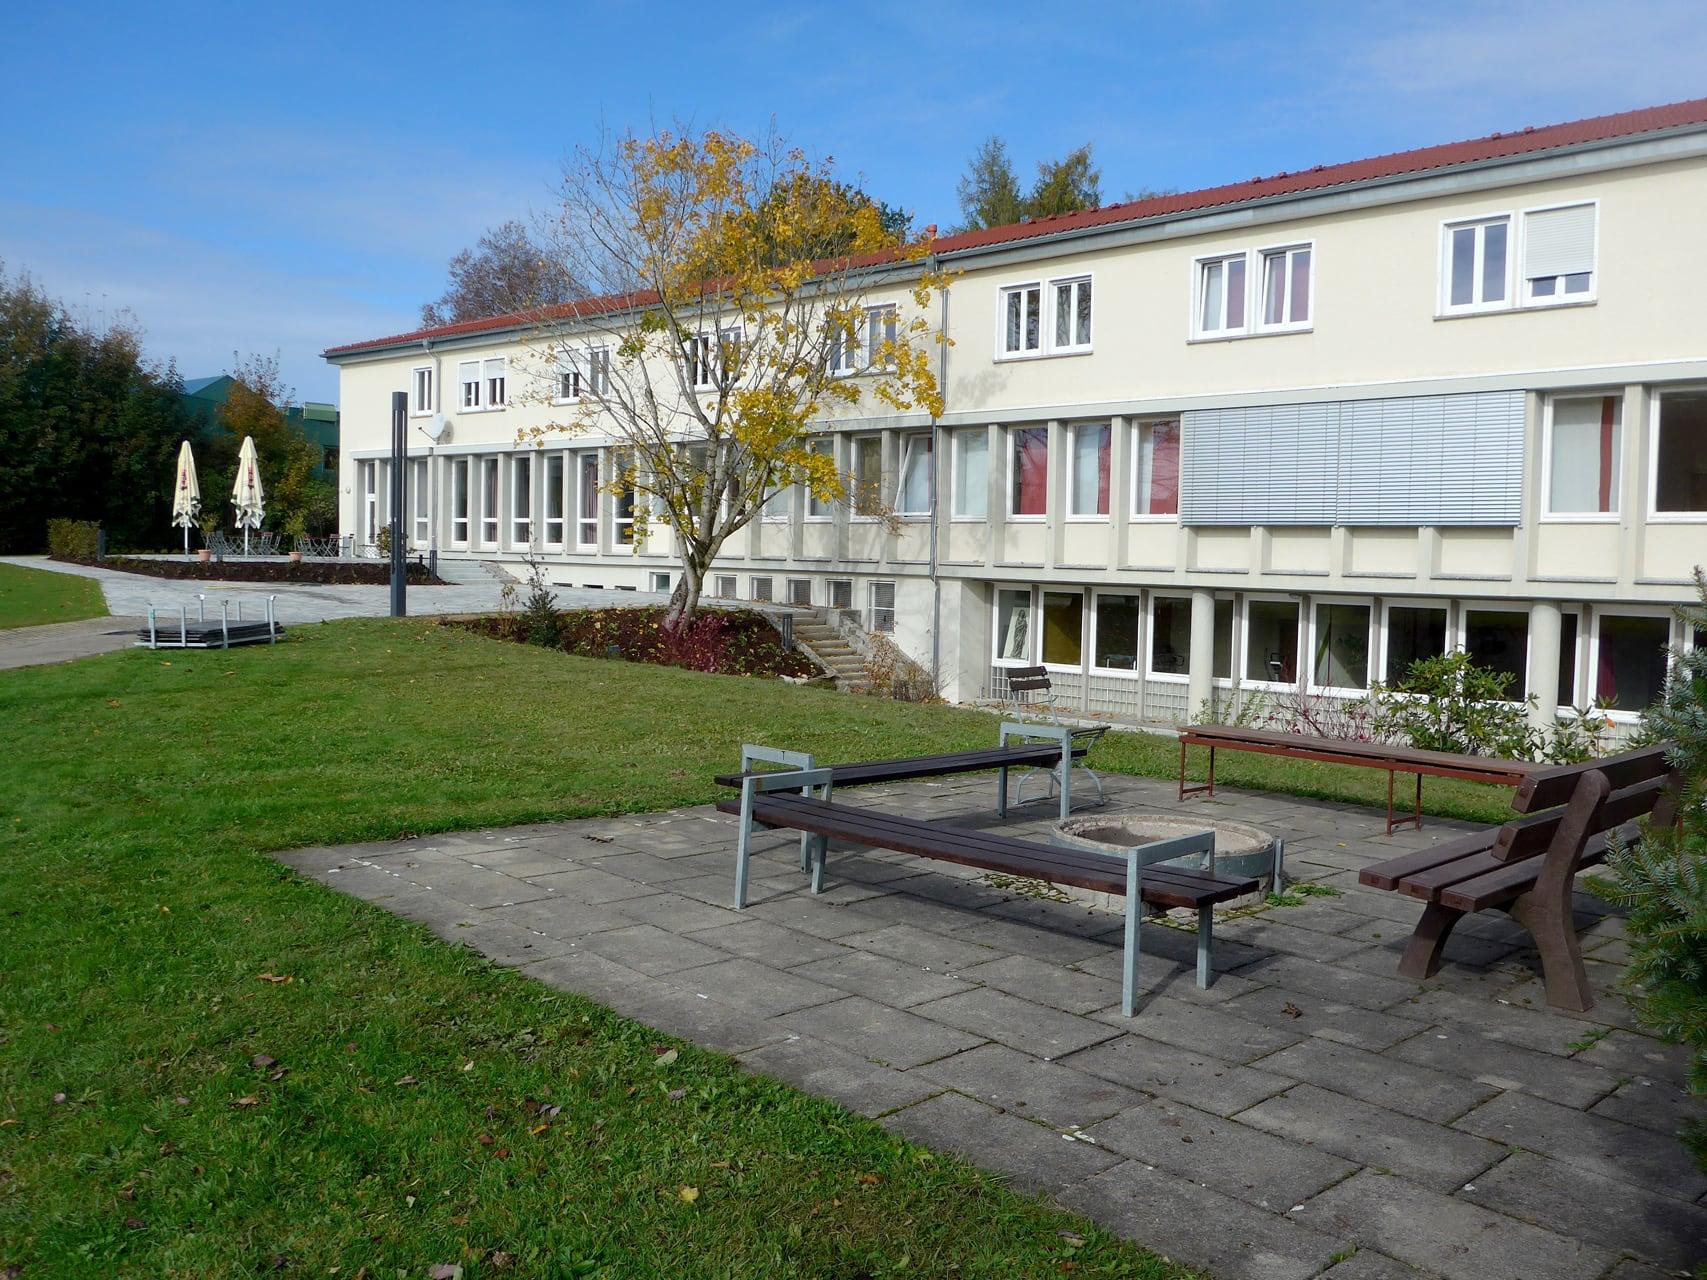 Tagungshaus Regina Pacis - Leutkirch